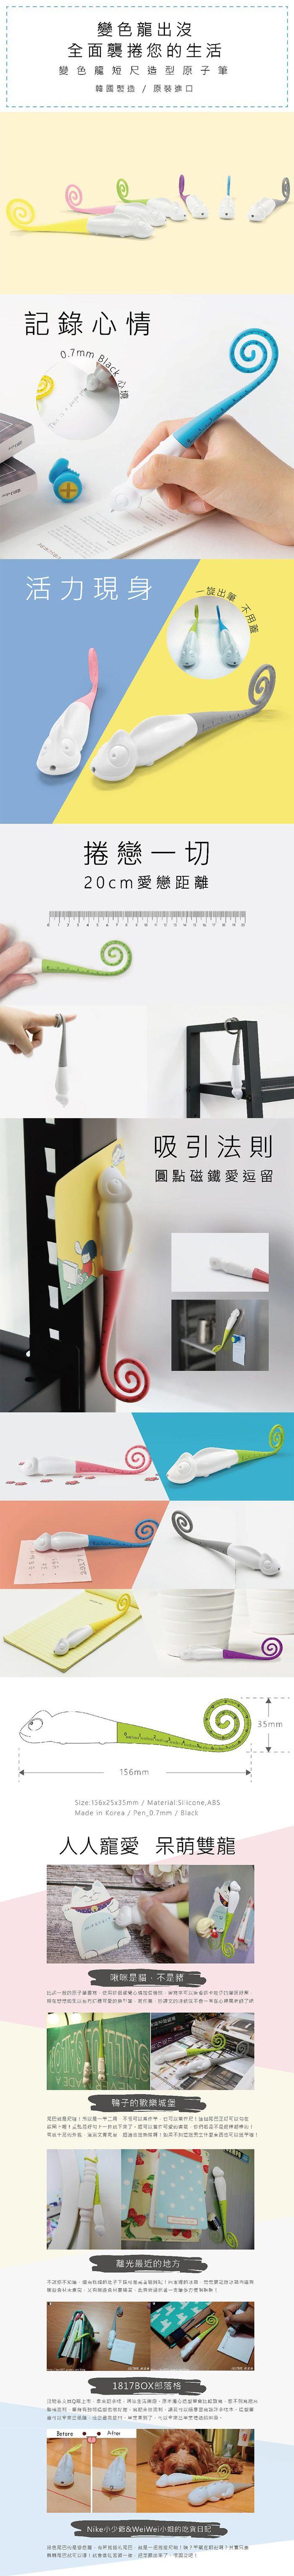 TOYOYO|變色龍短尺造型原子筆 - 淺灰